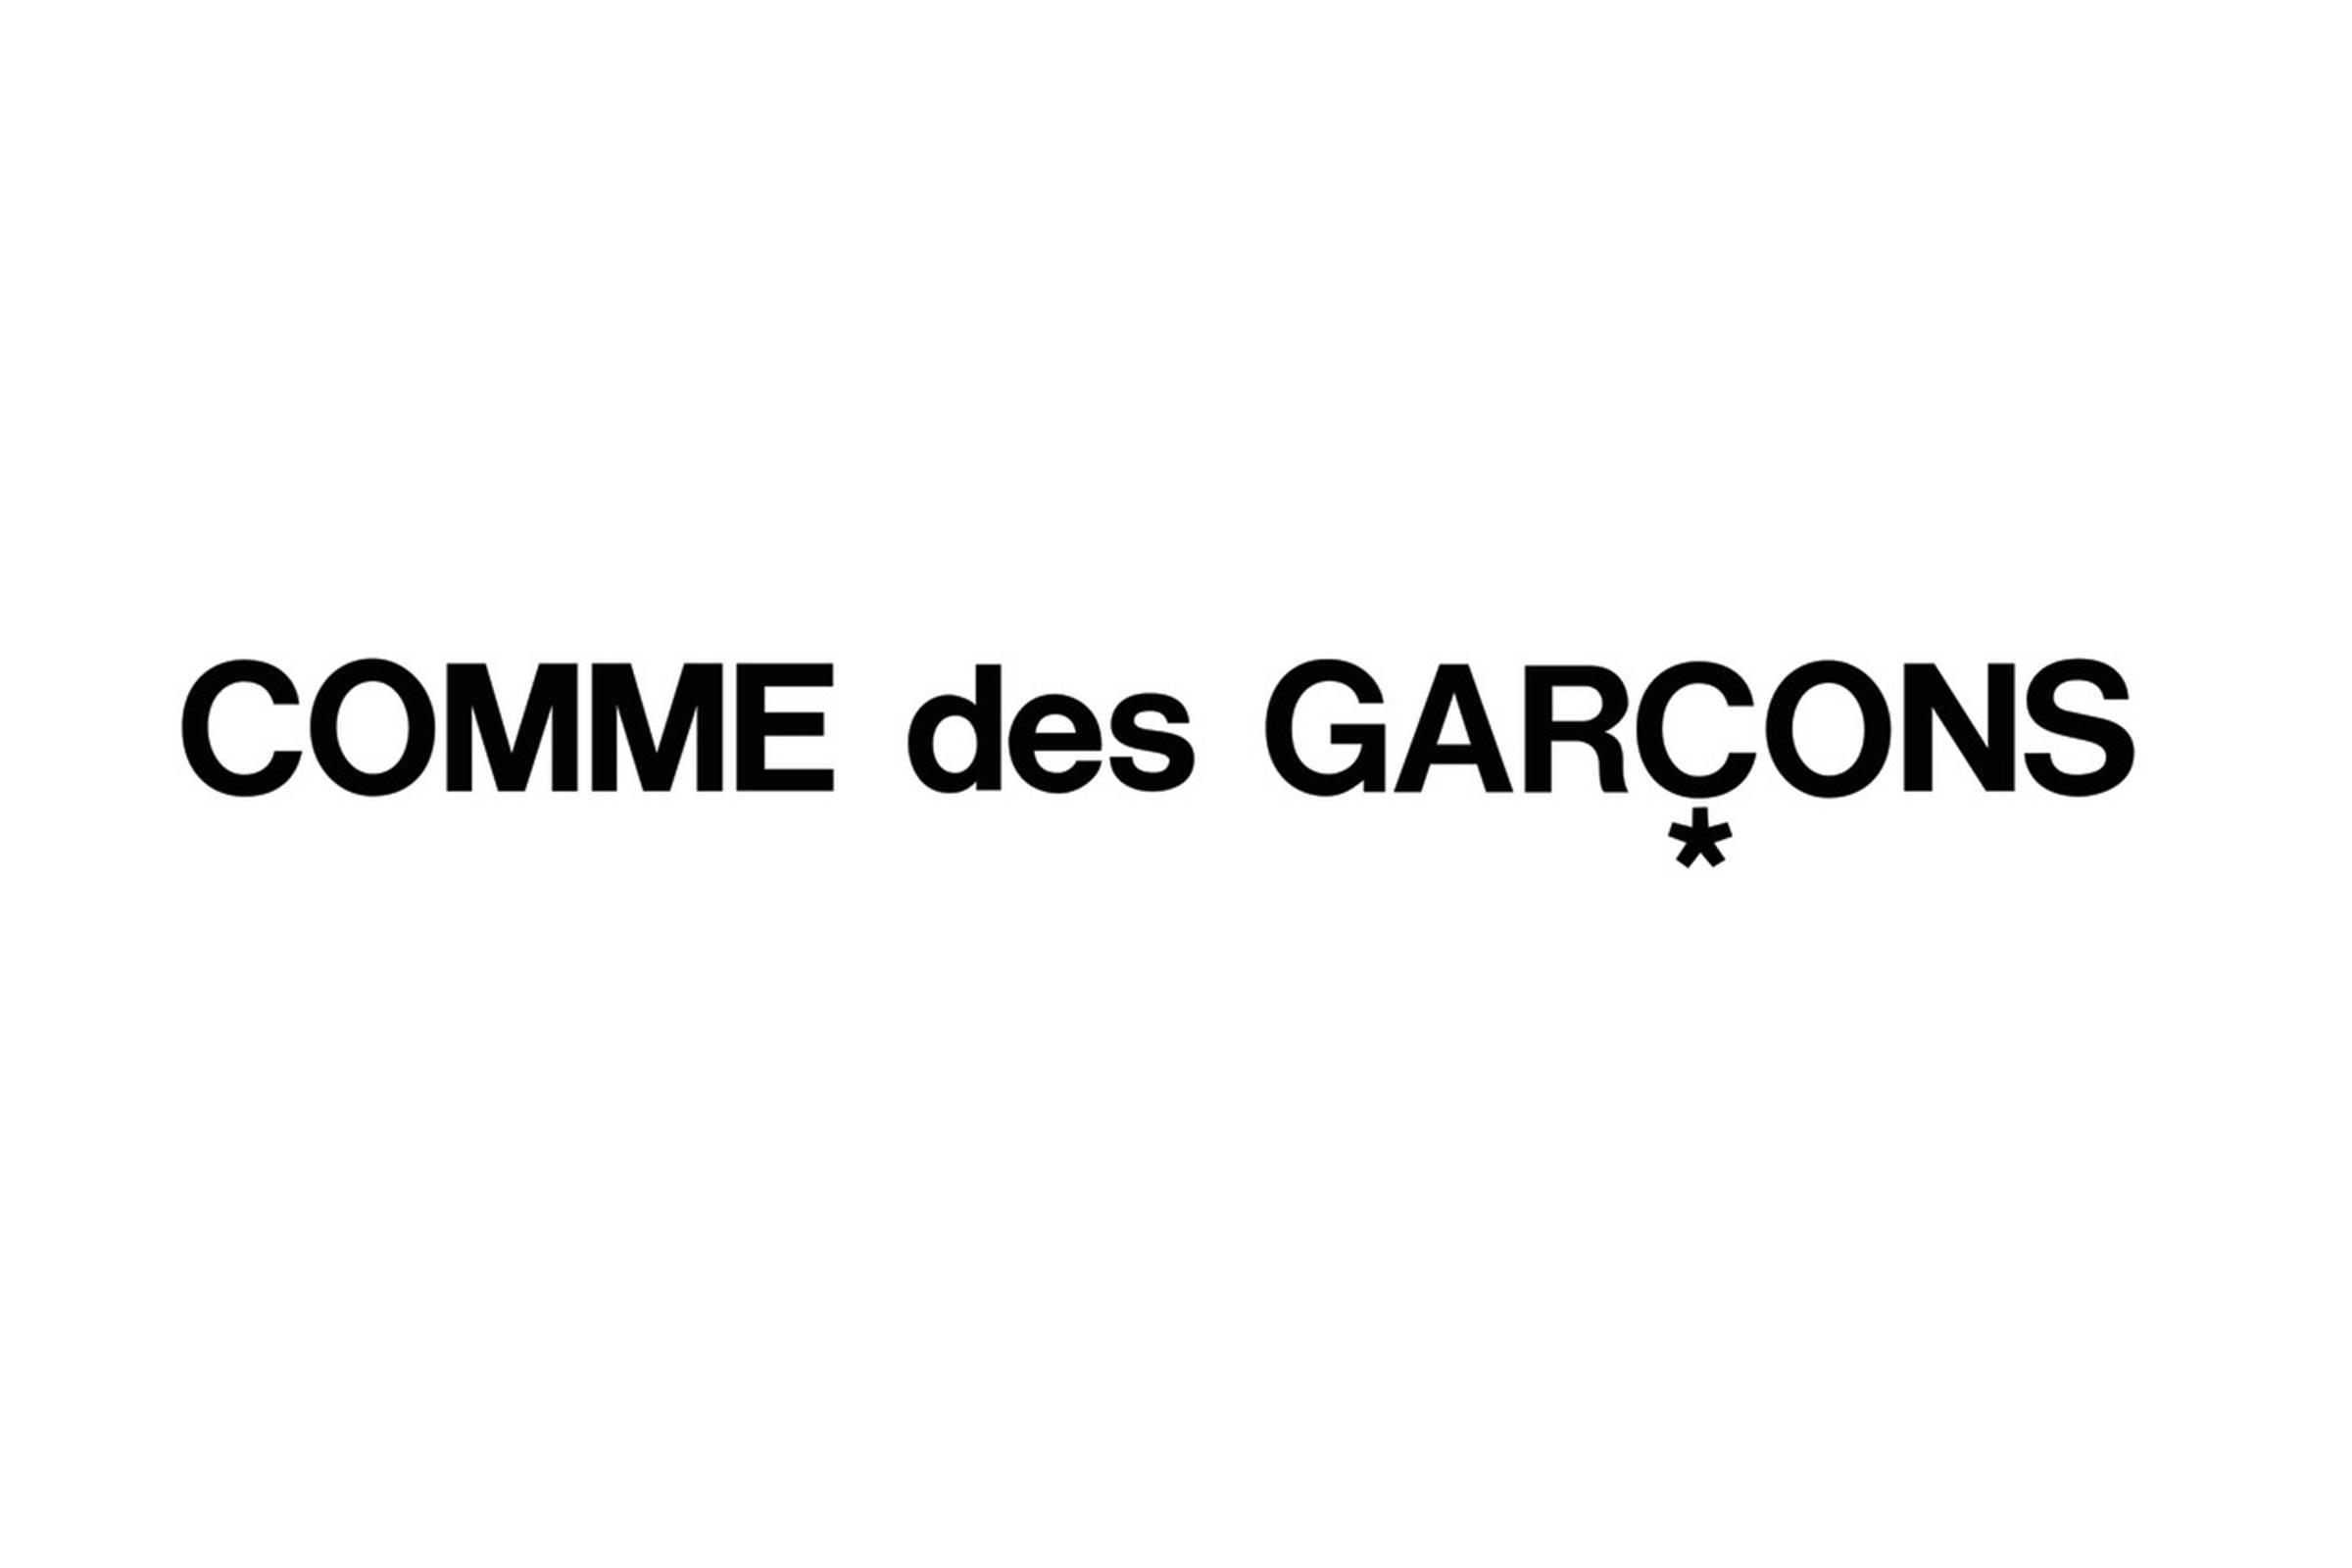 256143abea46 A Comprehensive Guide to the Comme Universe - Comme Des Garcons ...